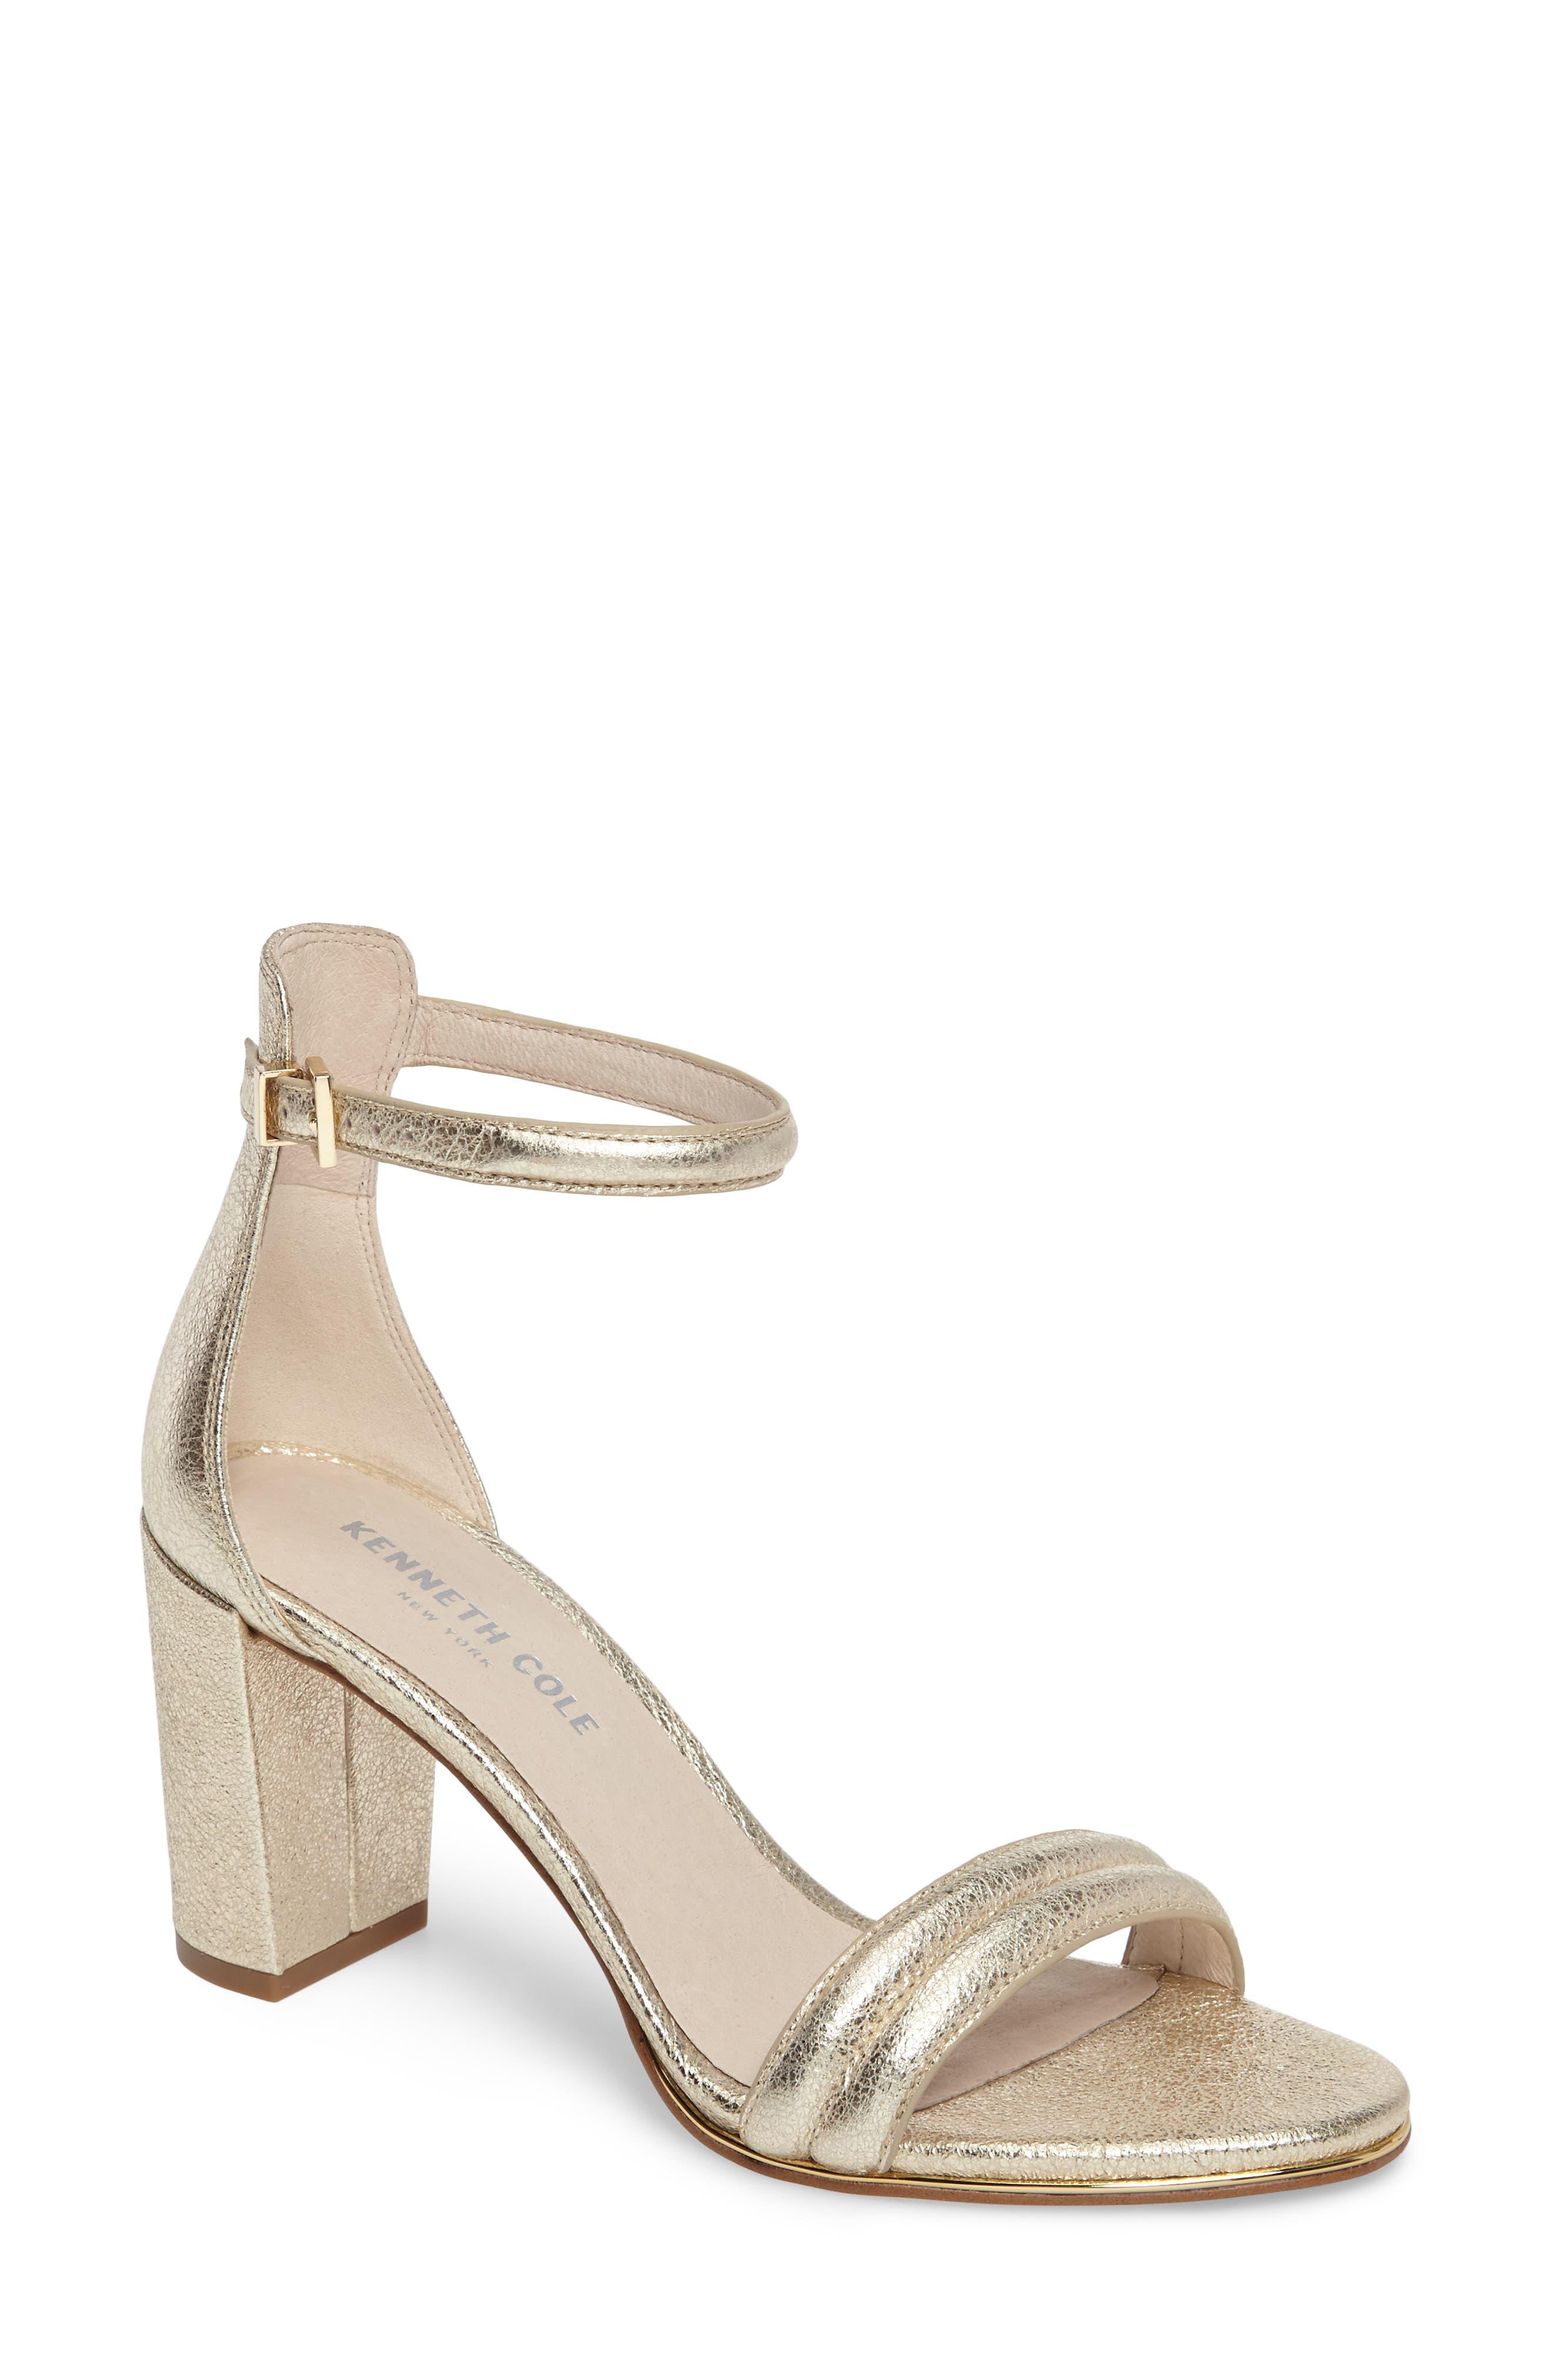 KENNETH COLE NEW YORK Lex Ankle Strap Sandal